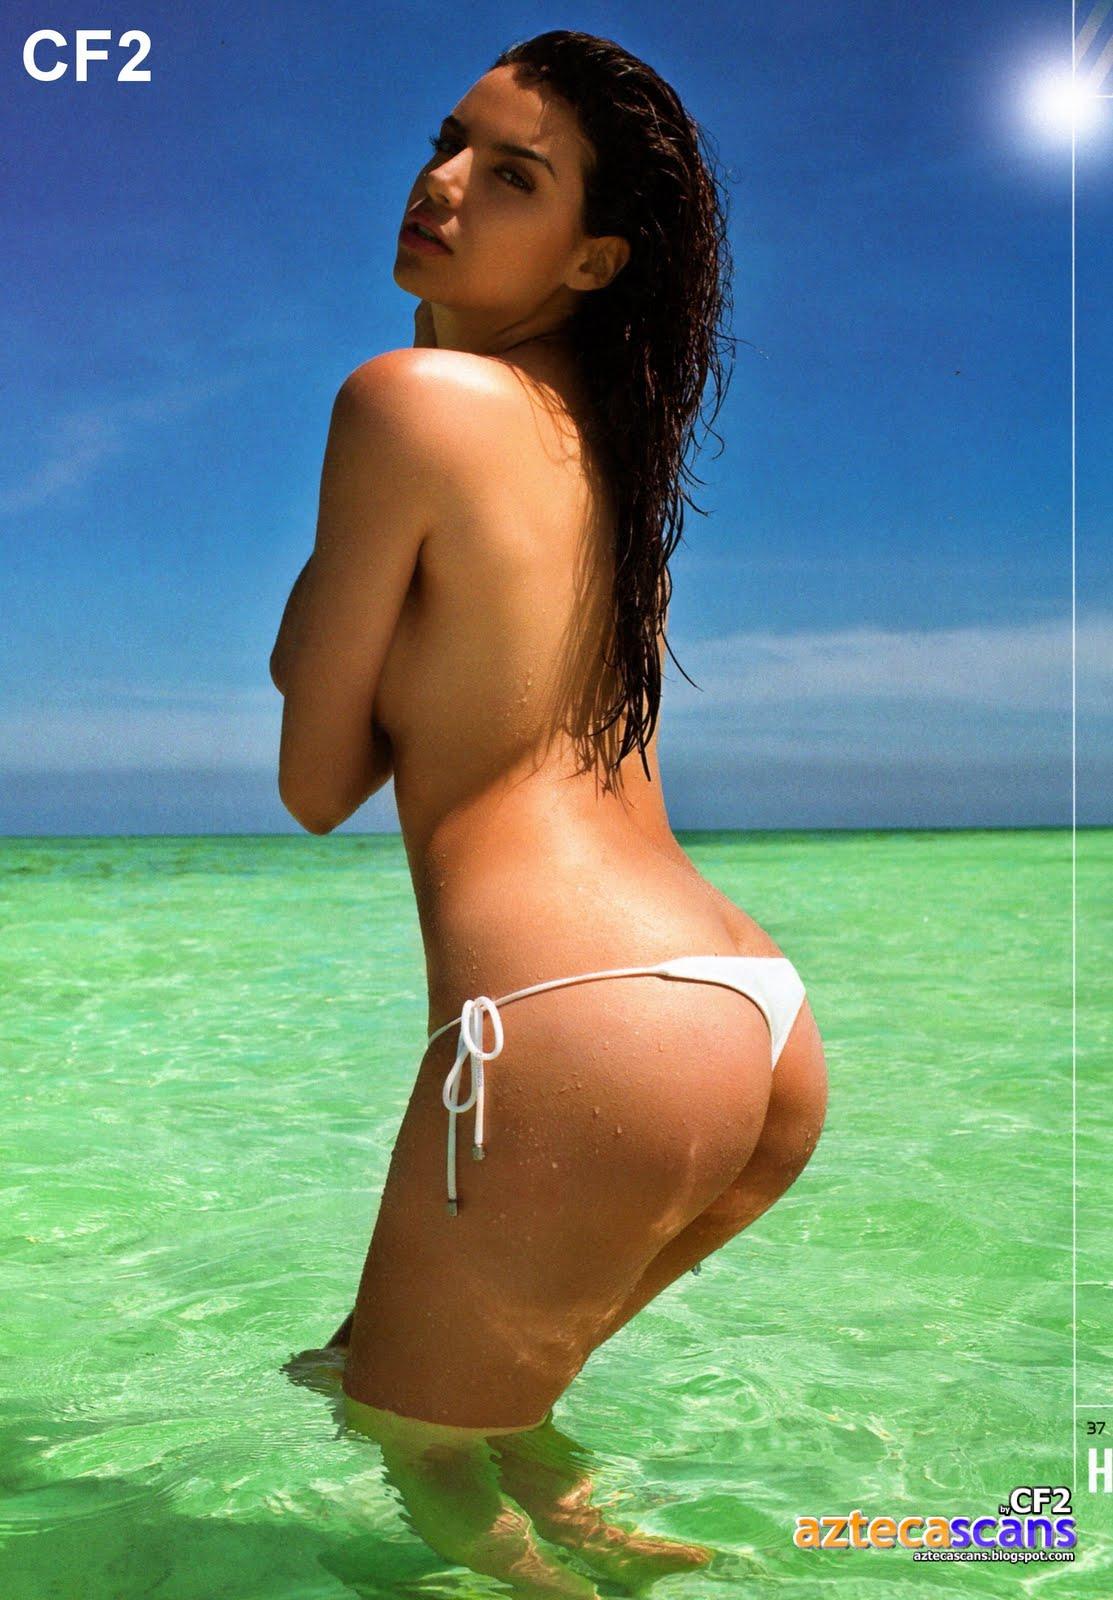 Fotos De Chicas Con Pantalones Apretados Lindas Filmvz Portal